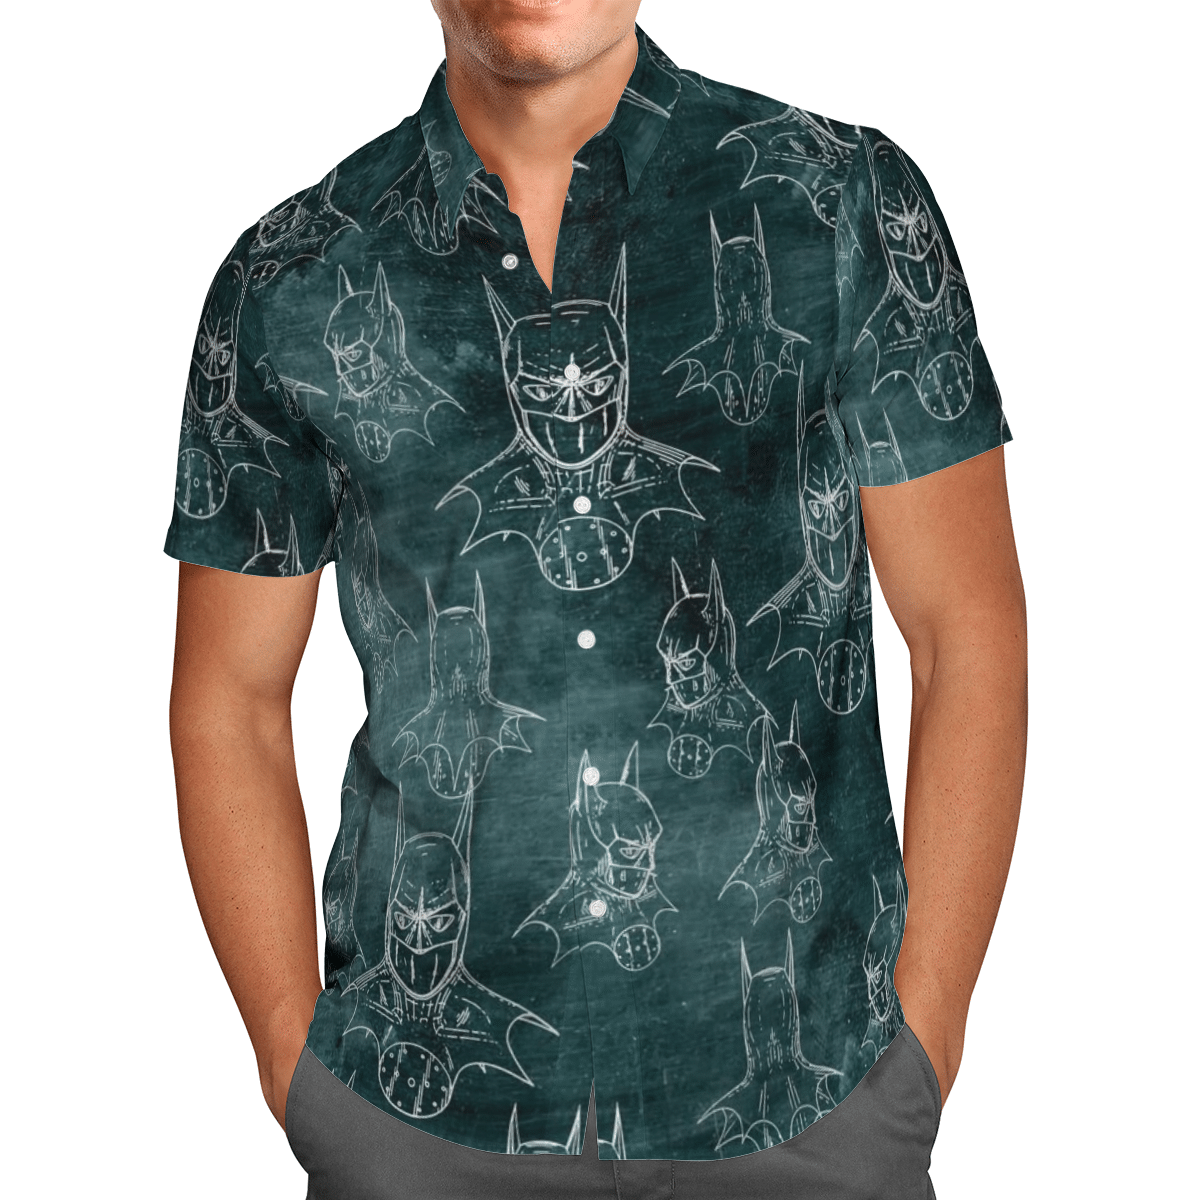 Batman Pattern Uniform Green Hawaiian shirt